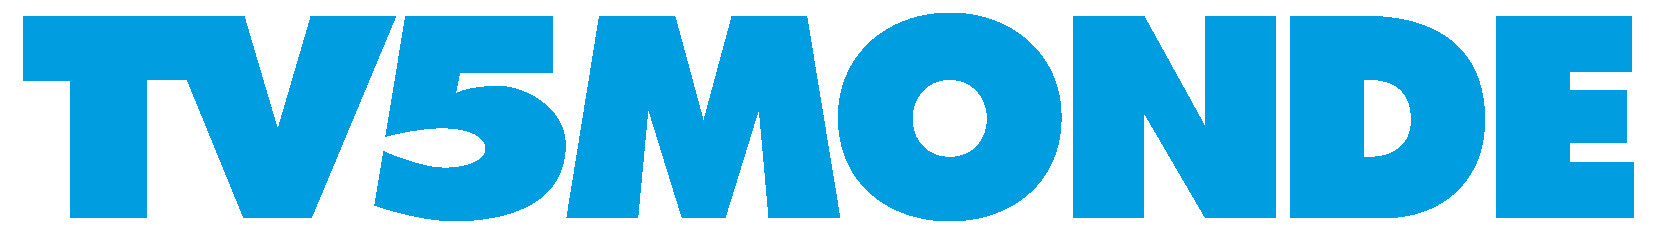 TV5MONDE_logo_CMJN.jpg